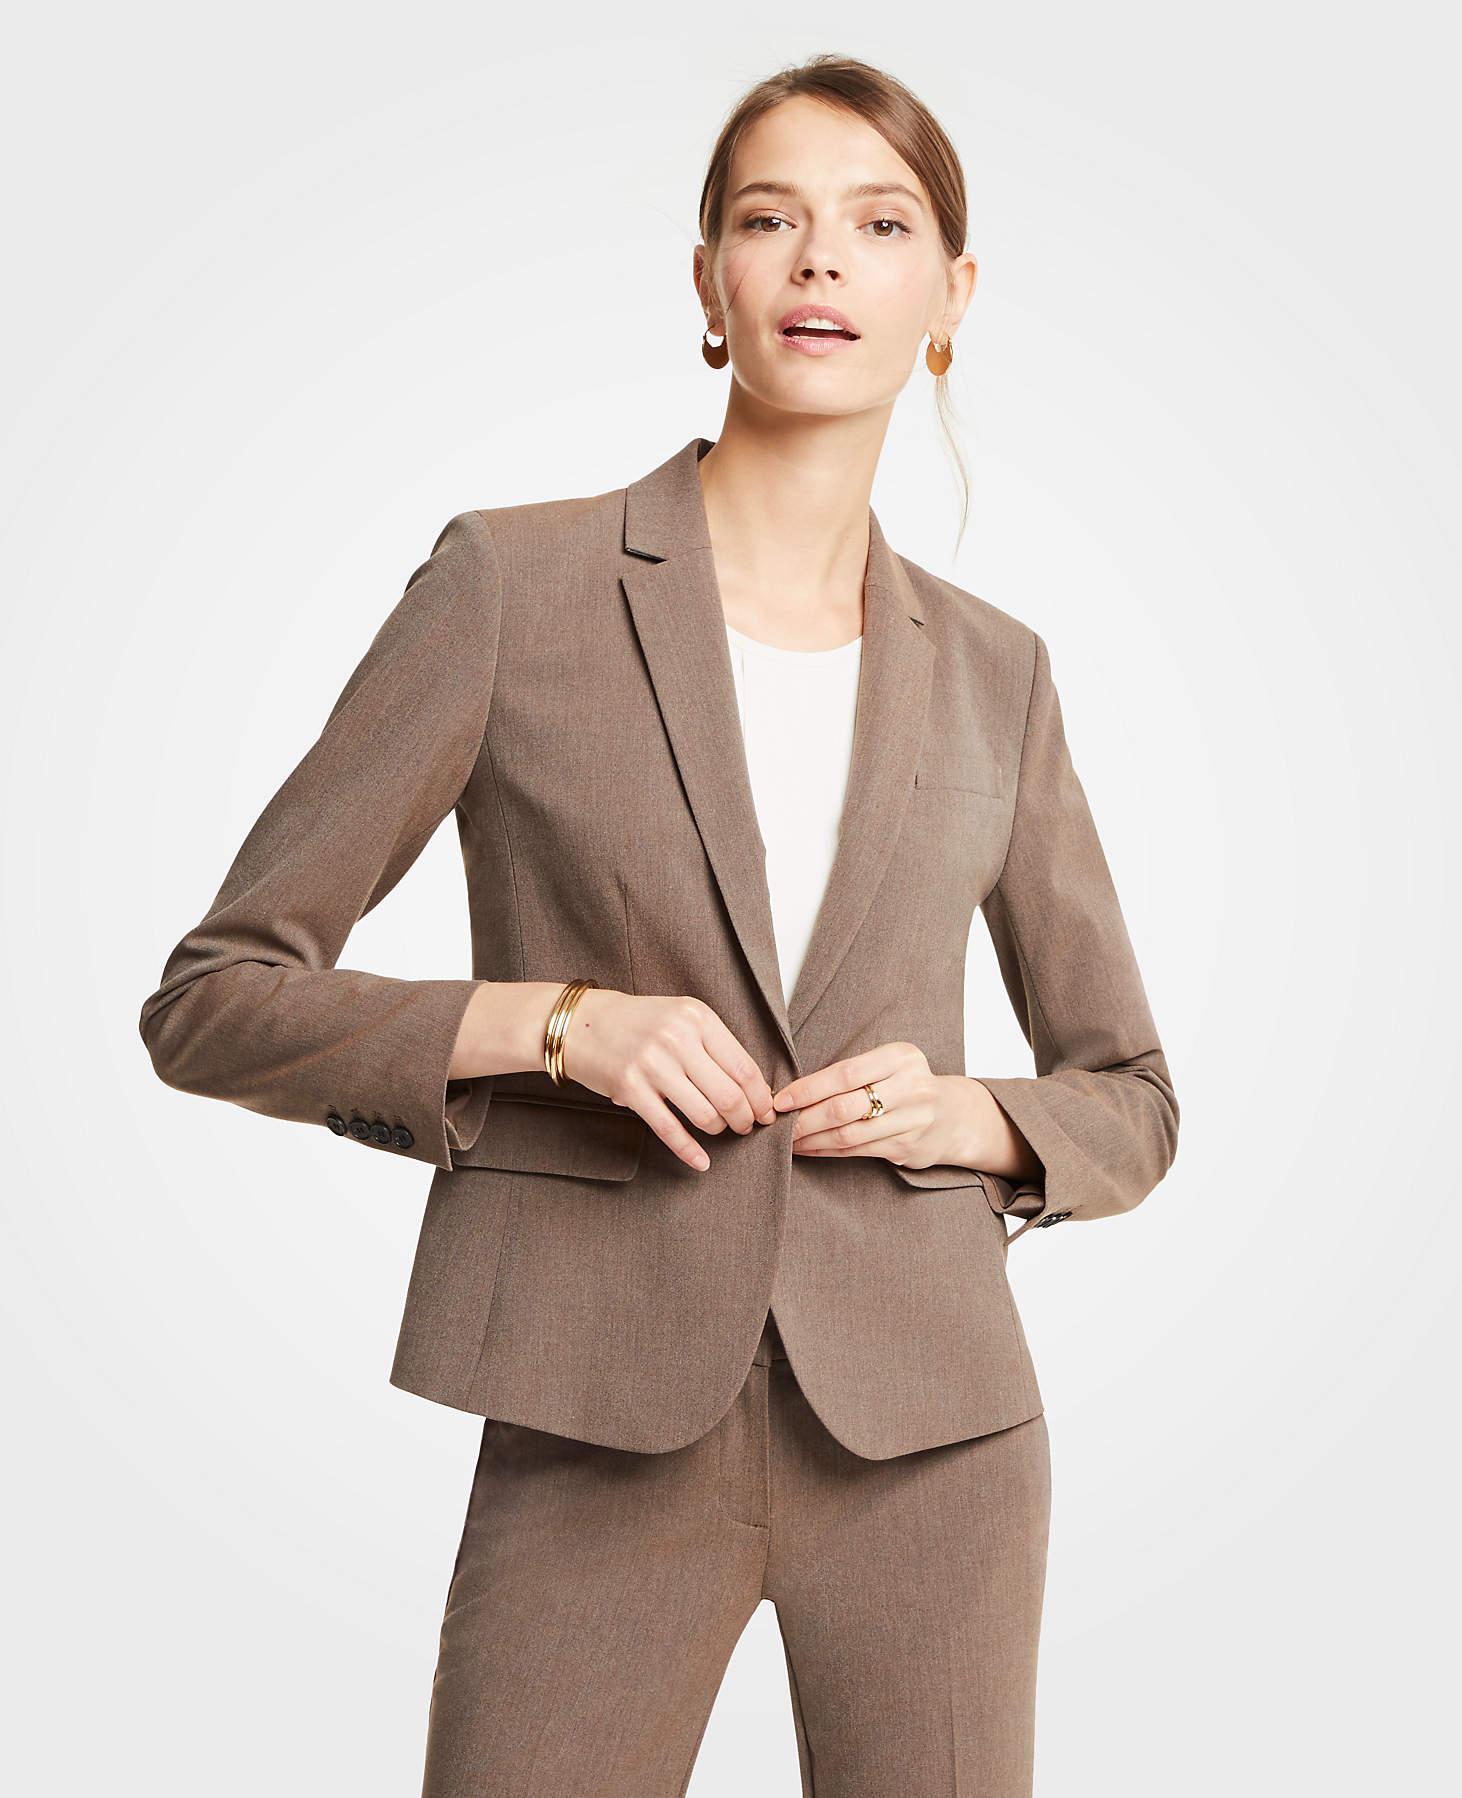 e755b901a Ann Taylor Petite Seasonless Stretch One Button Jacket in Brown - Lyst